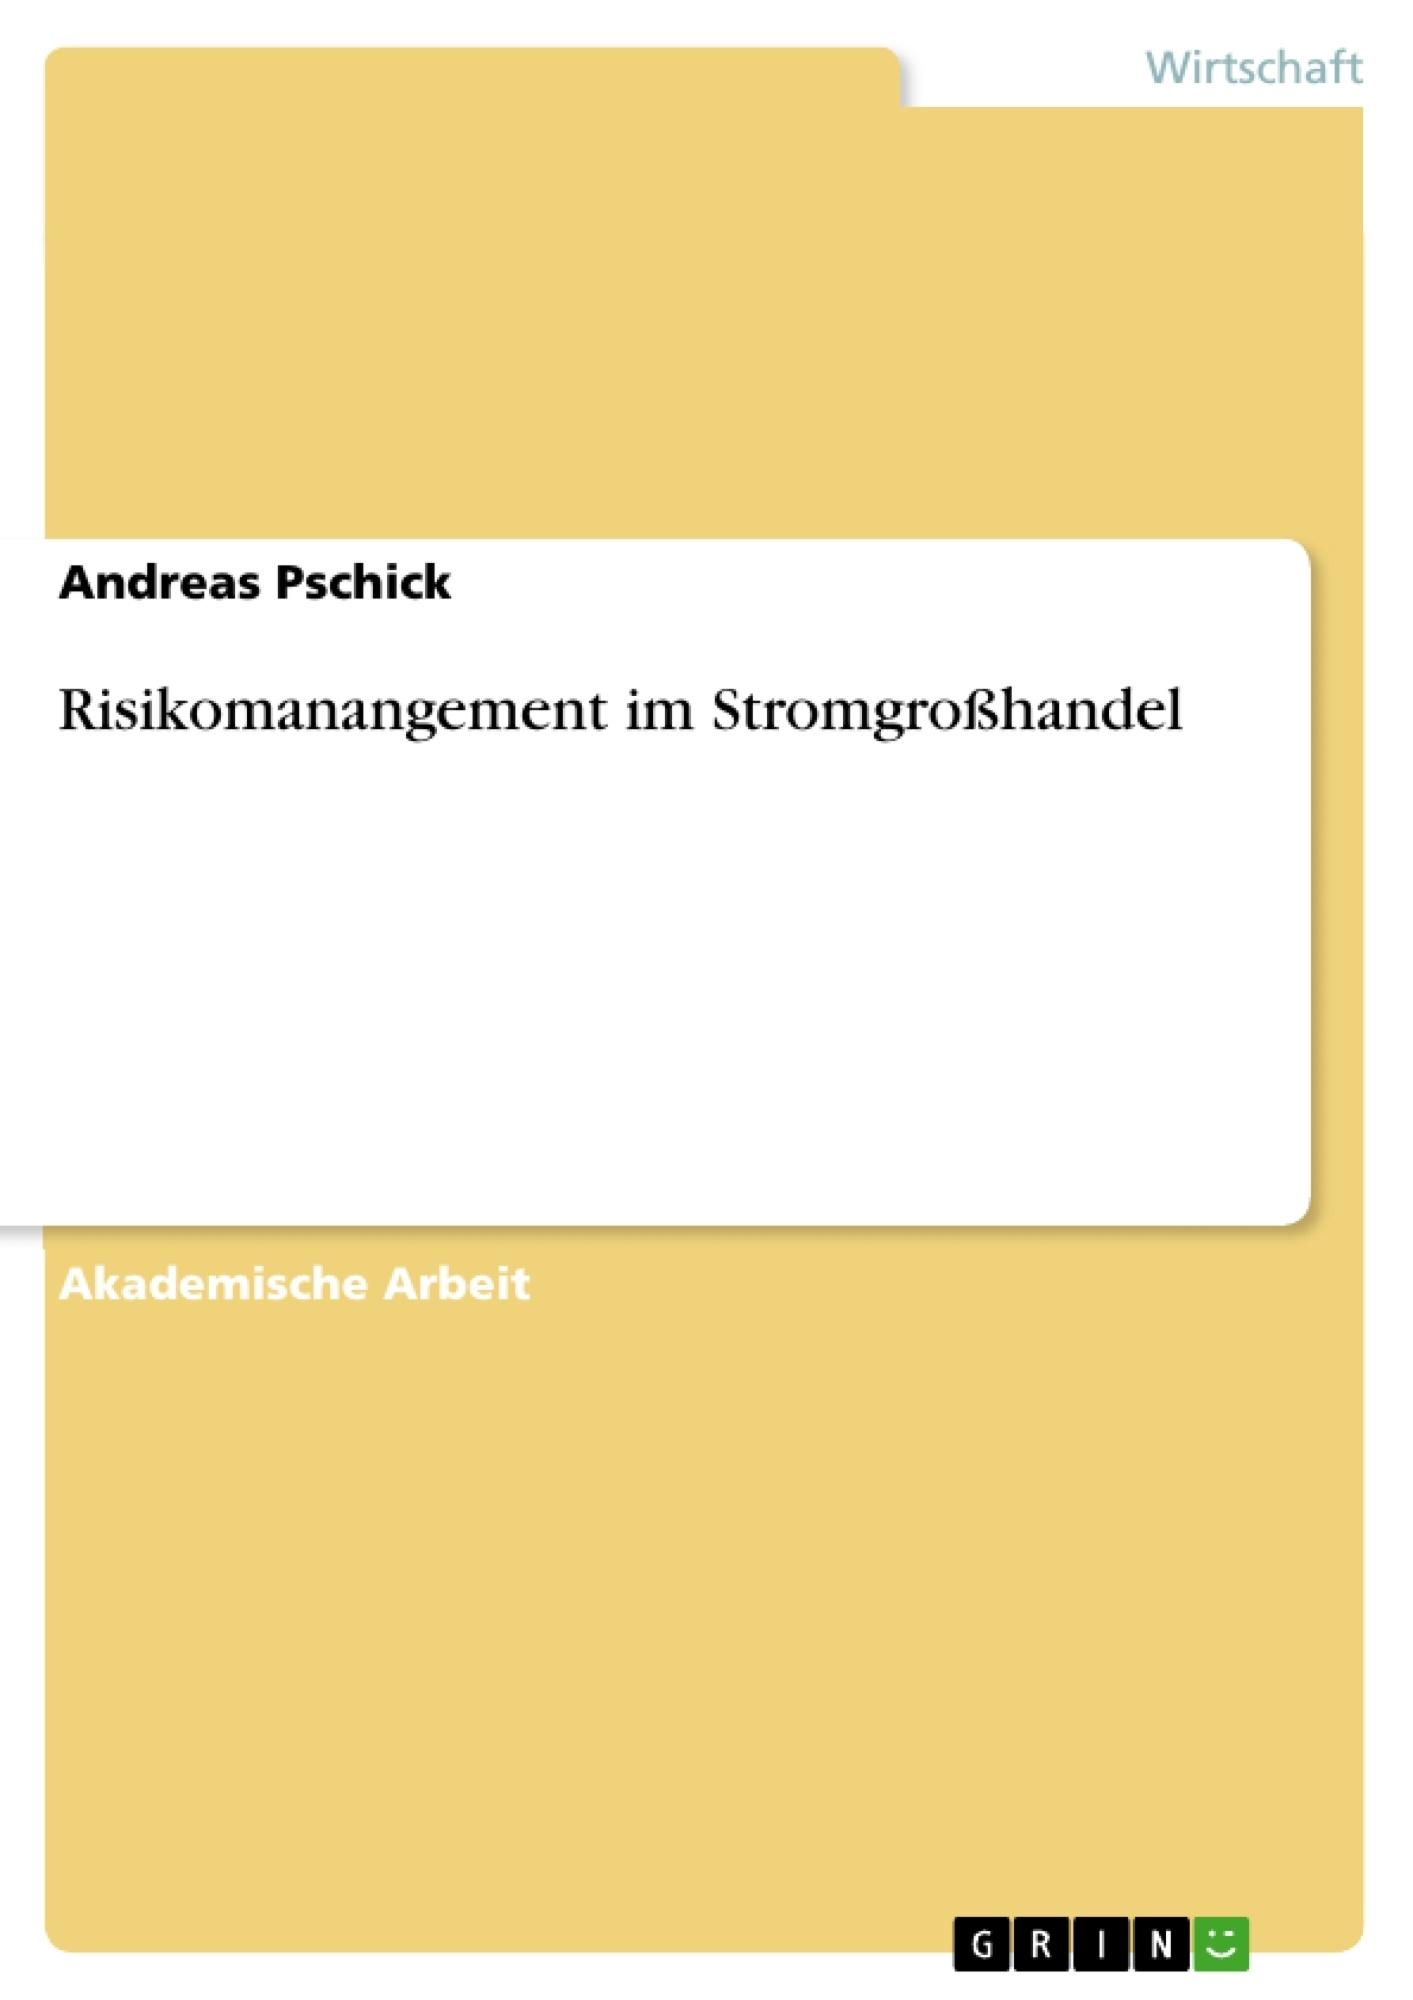 Titel: Risikomanangement im Stromgroßhandel